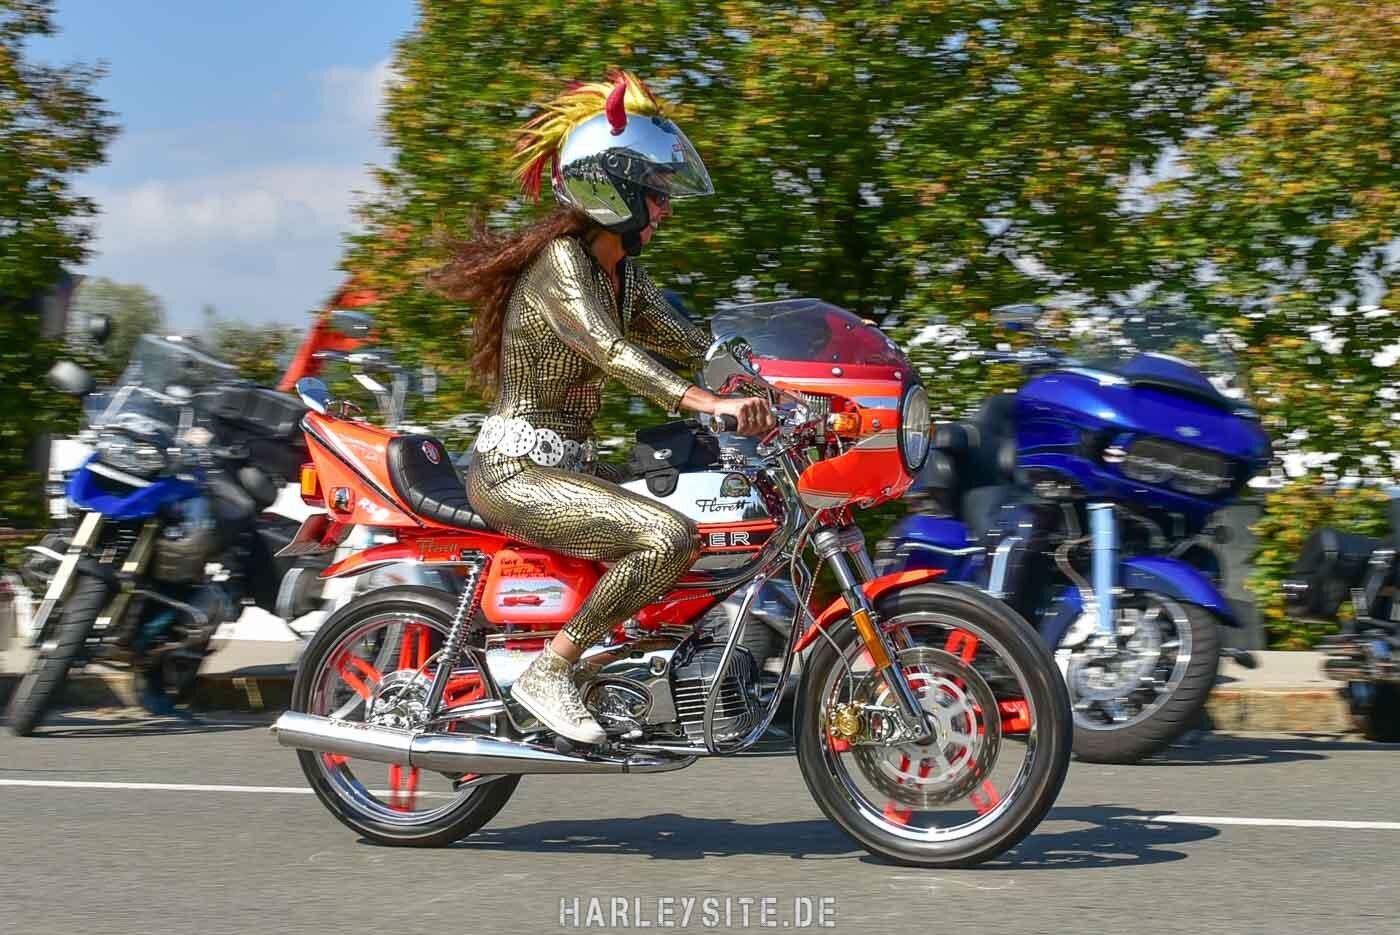 European-Bike-Week-9737